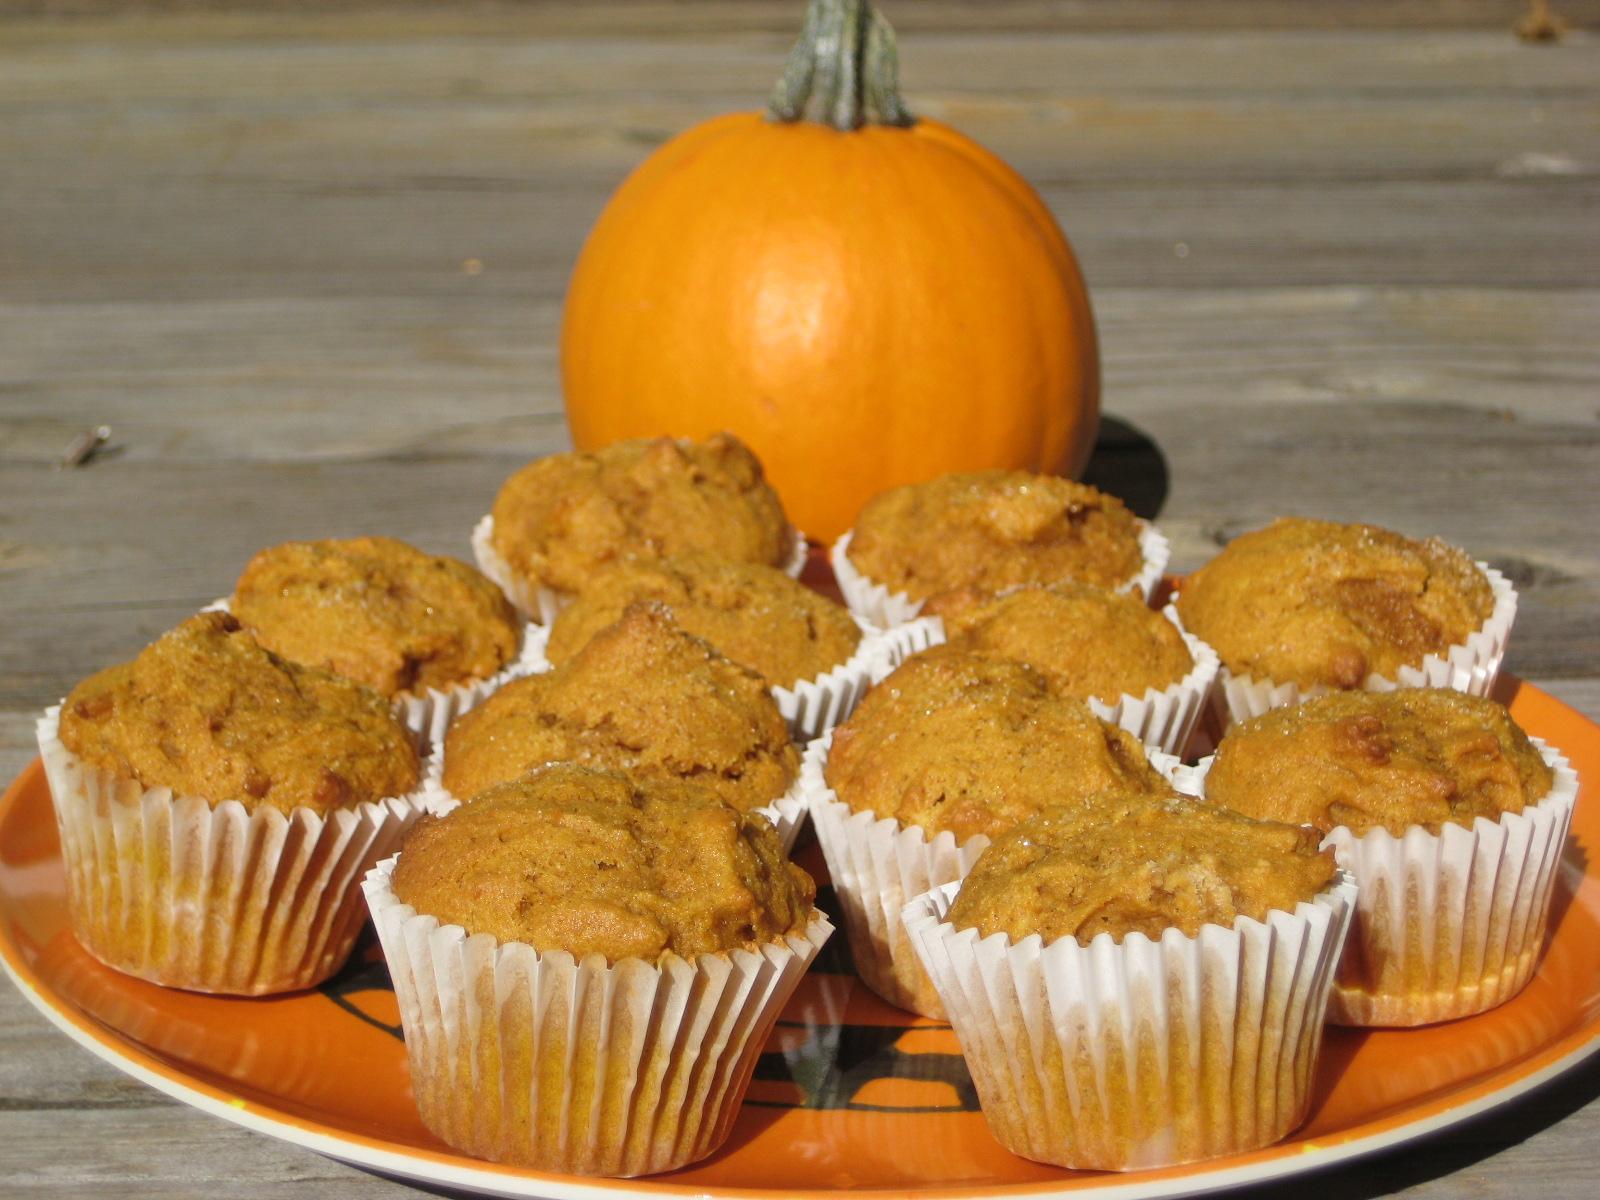 Healthy School Party Snack The Best Pumpkin Mini Muffins